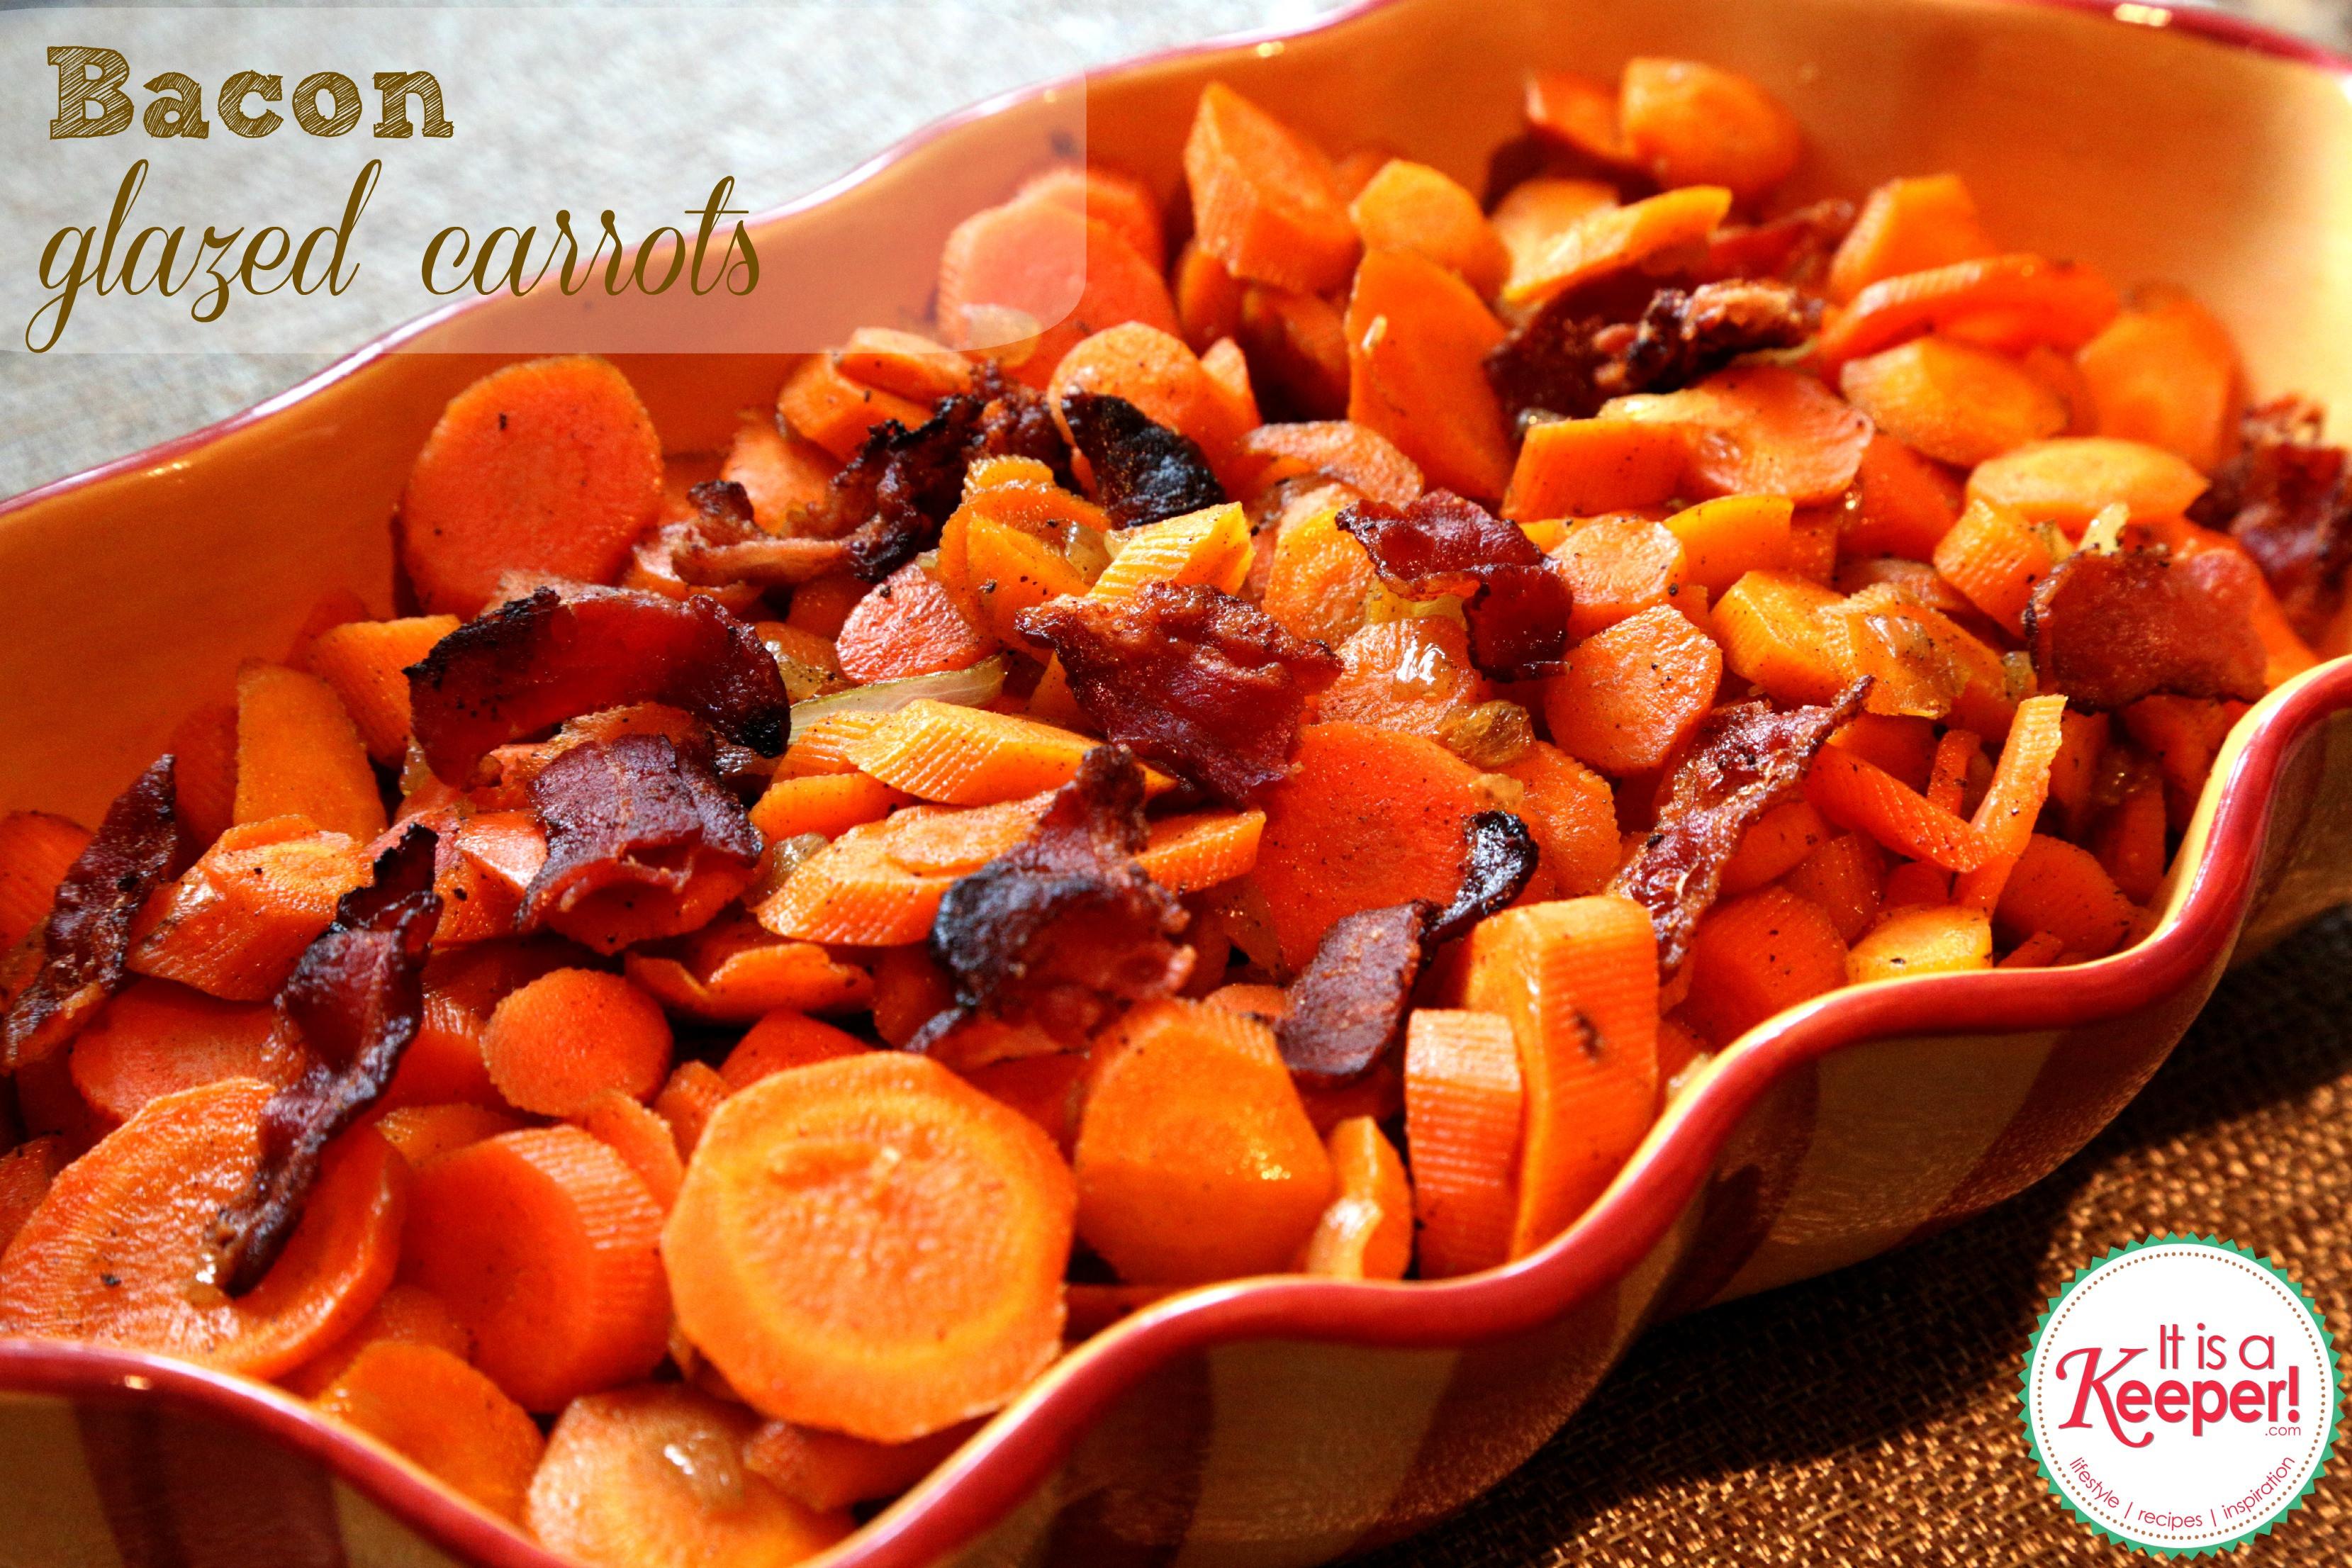 Thanksgiving Carrot Recipes  Bacon Glazed Carrots